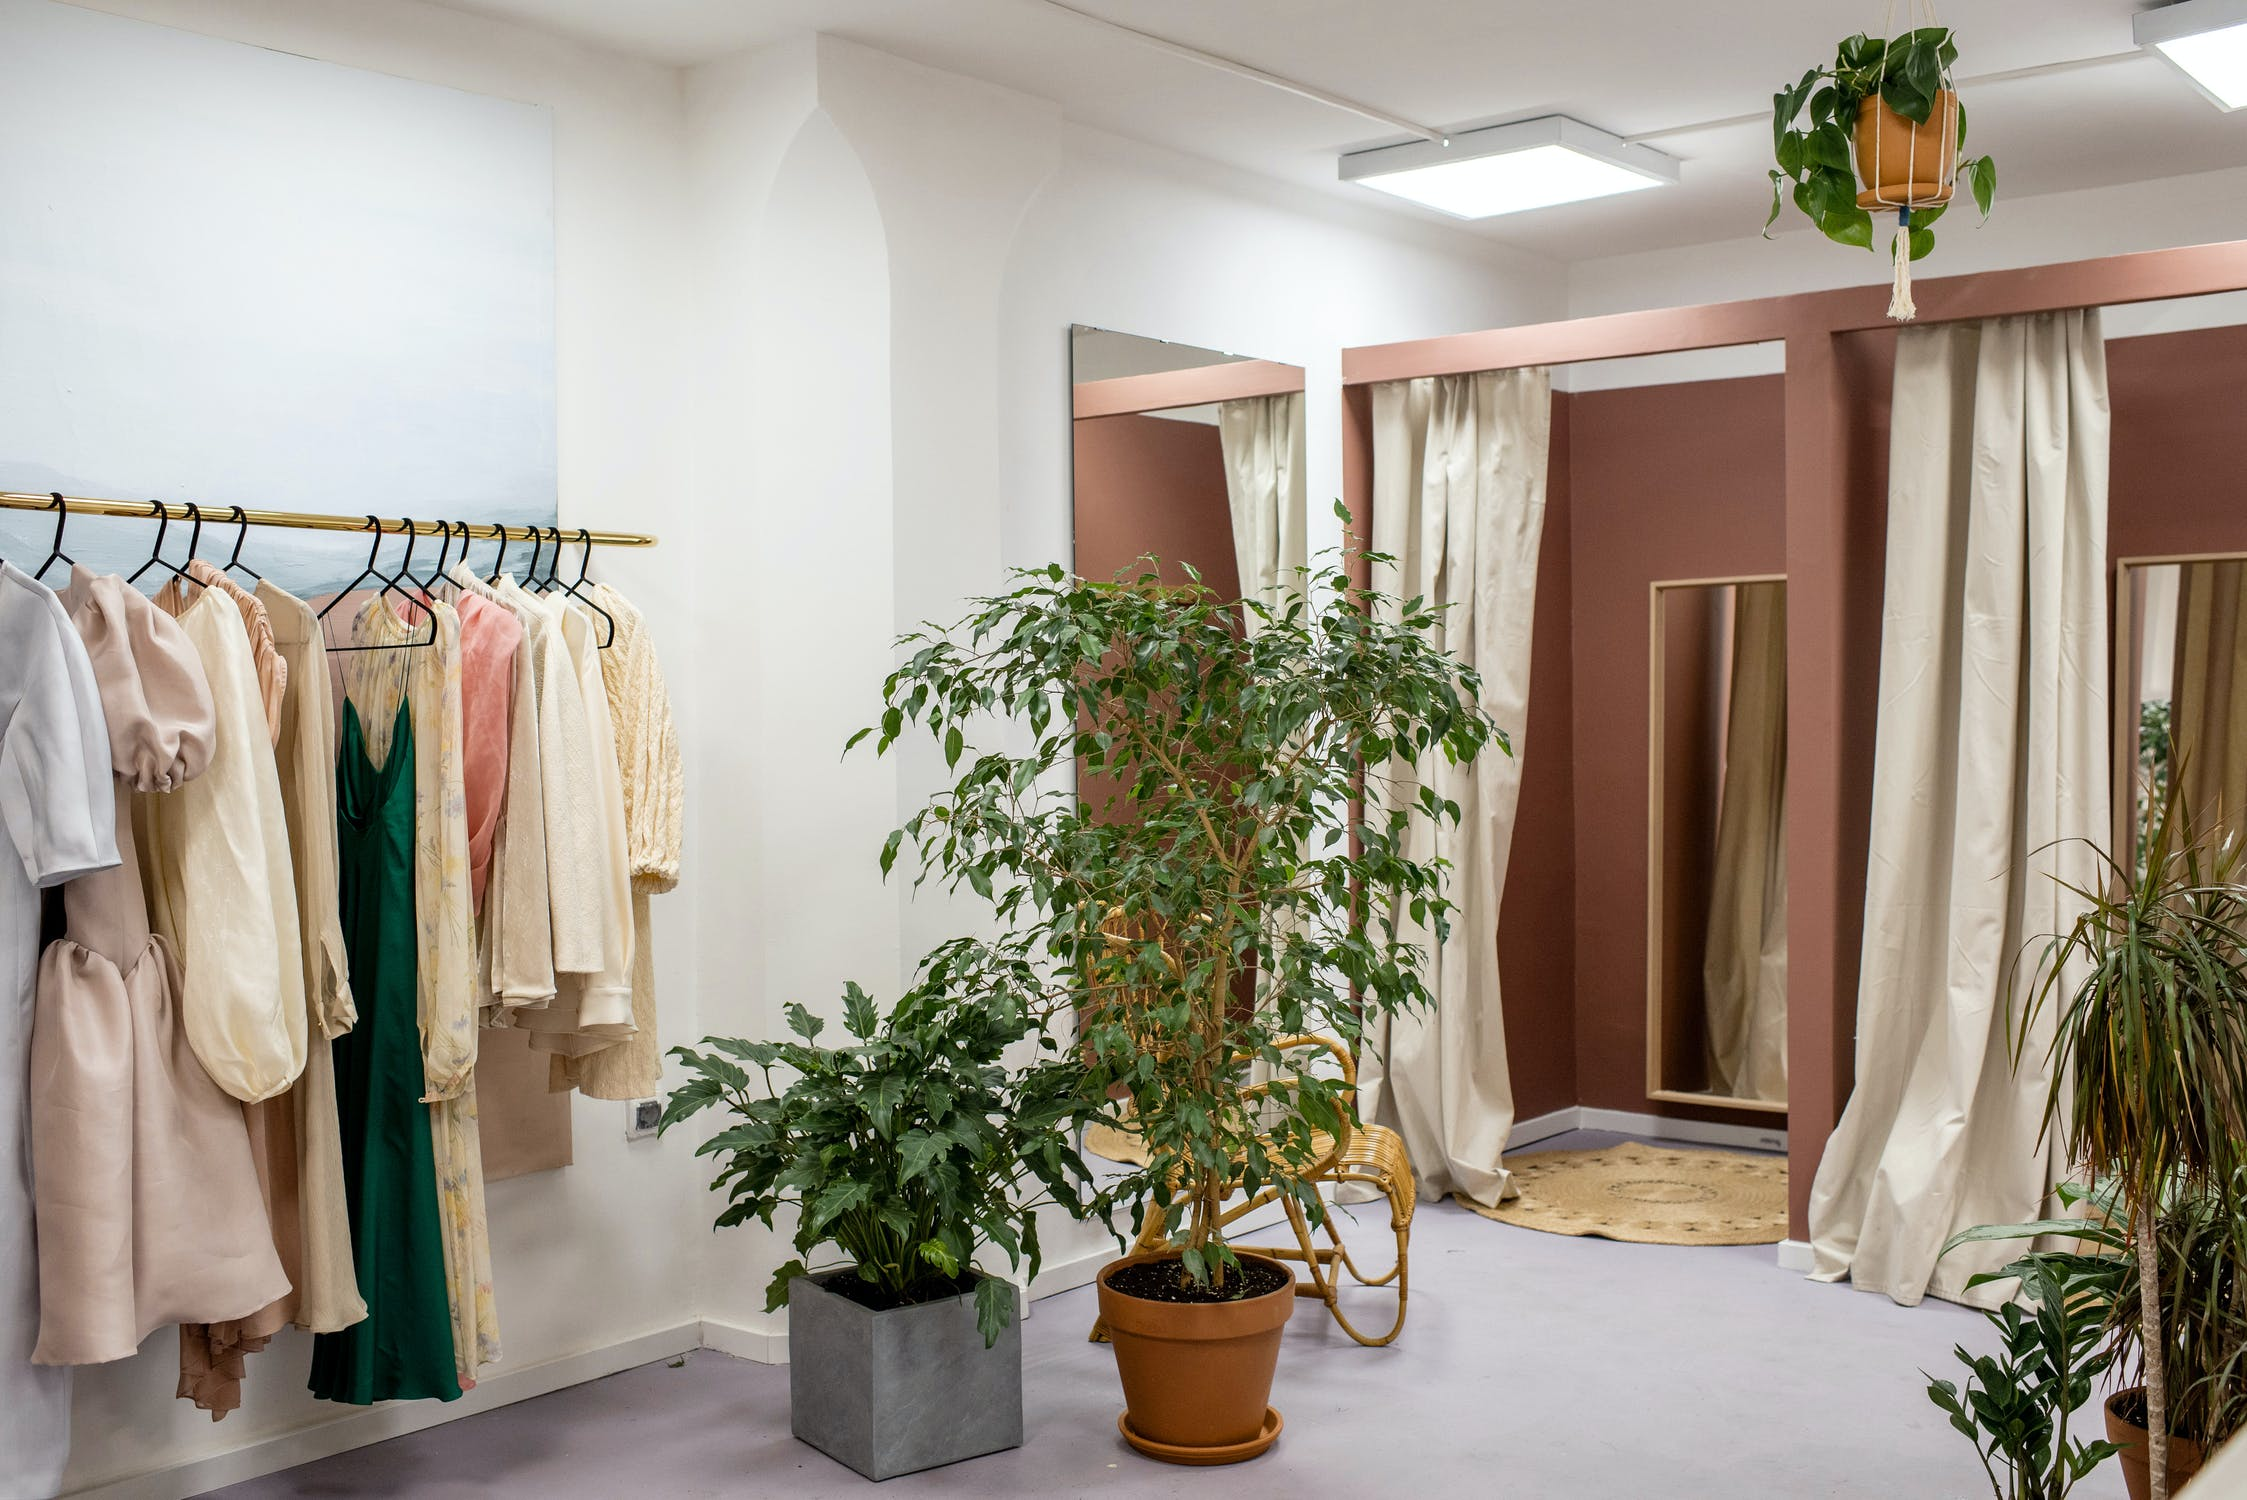 enhance Shopify POS system - business needs